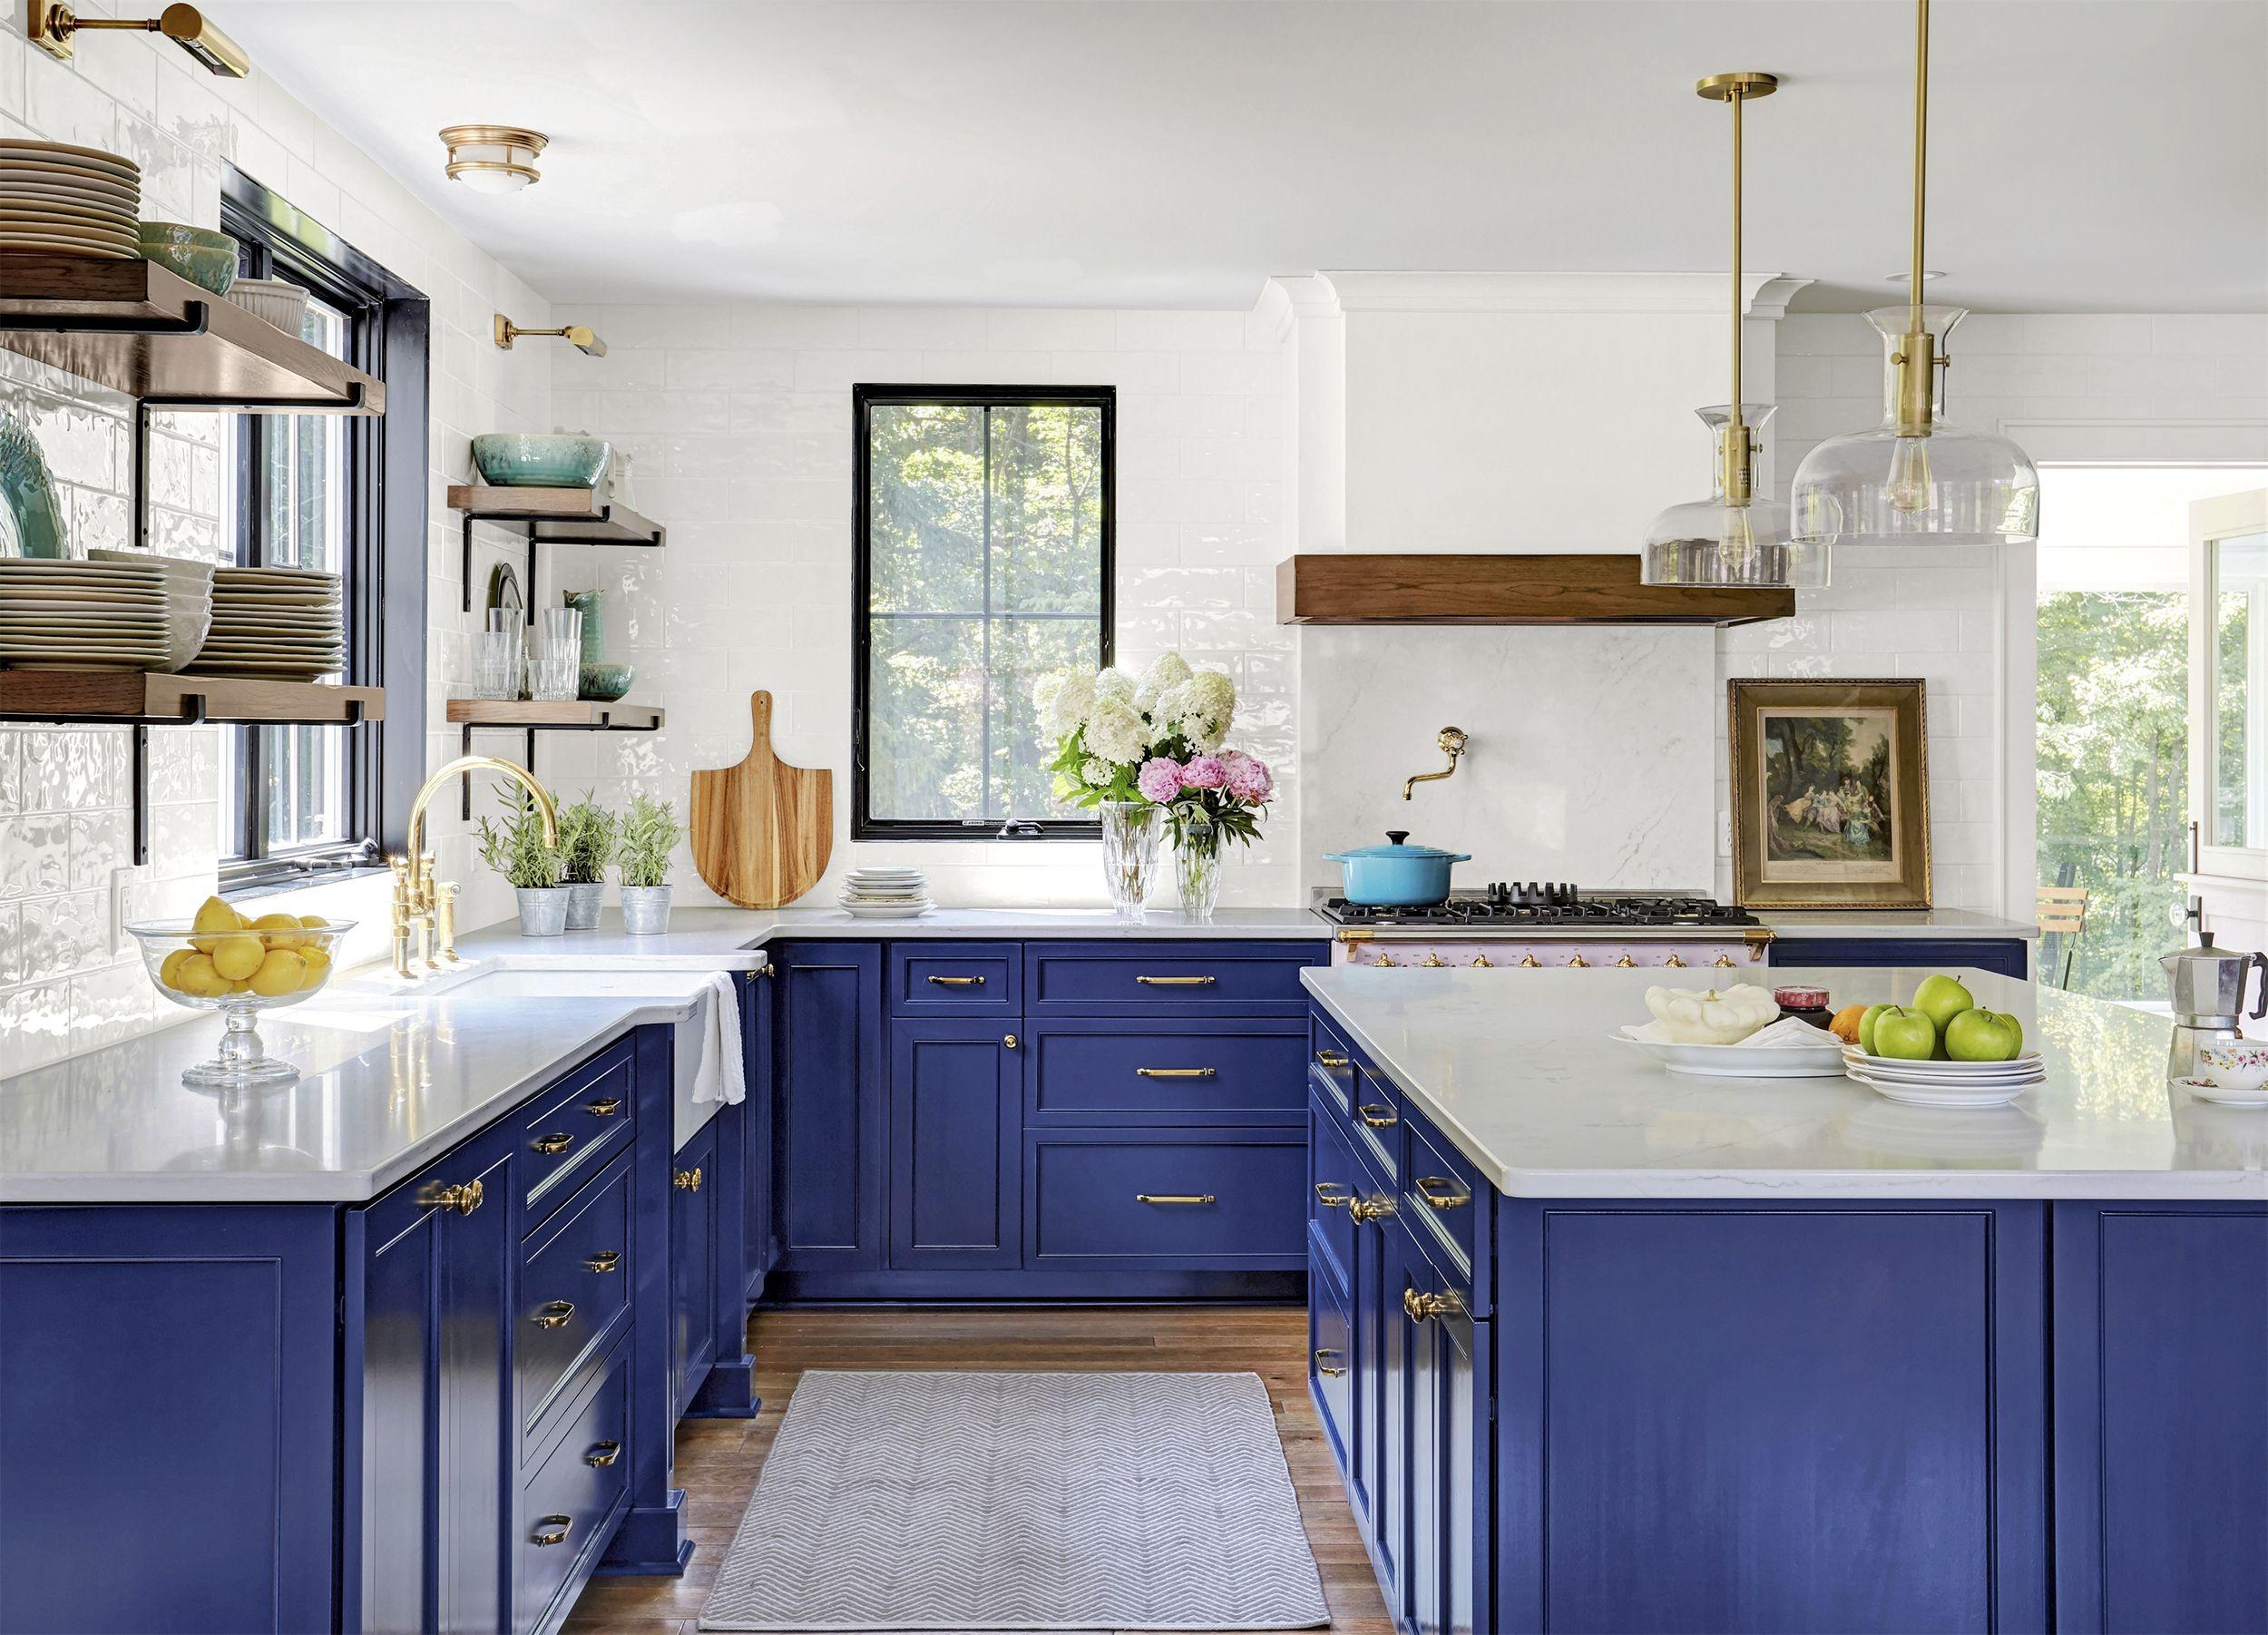 13 Stylish Modern Kitchen Ideas - Contemporary Kitchen ... on Modern Kitchen Ideas  id=72785